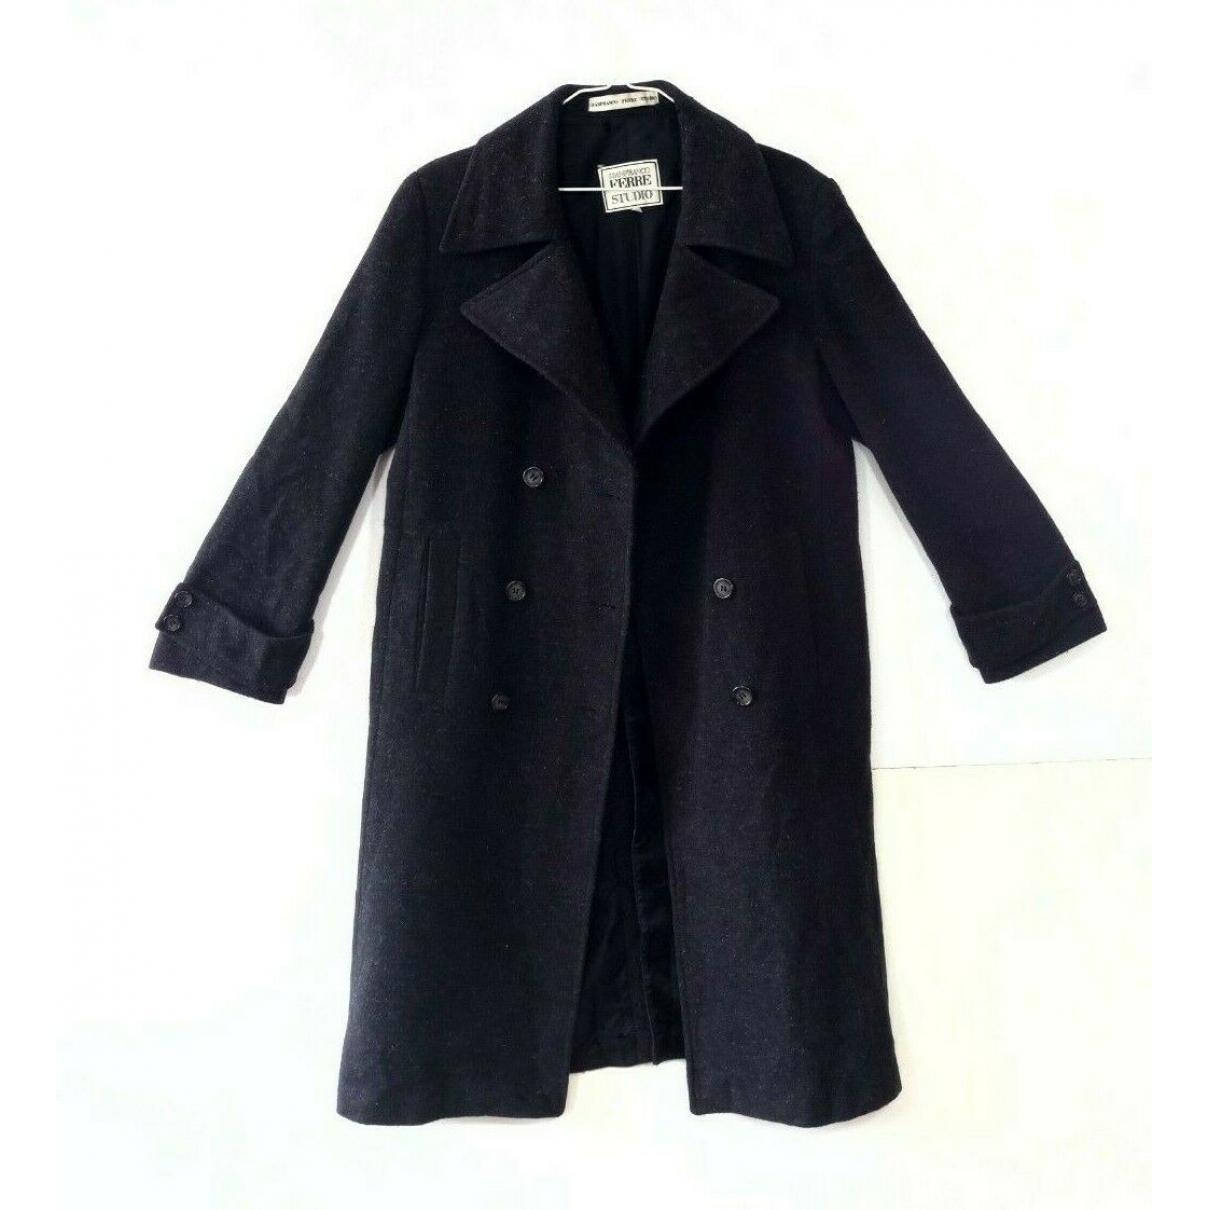 Gianfranco Ferré \N Anthracite coat  for Men 42 IT